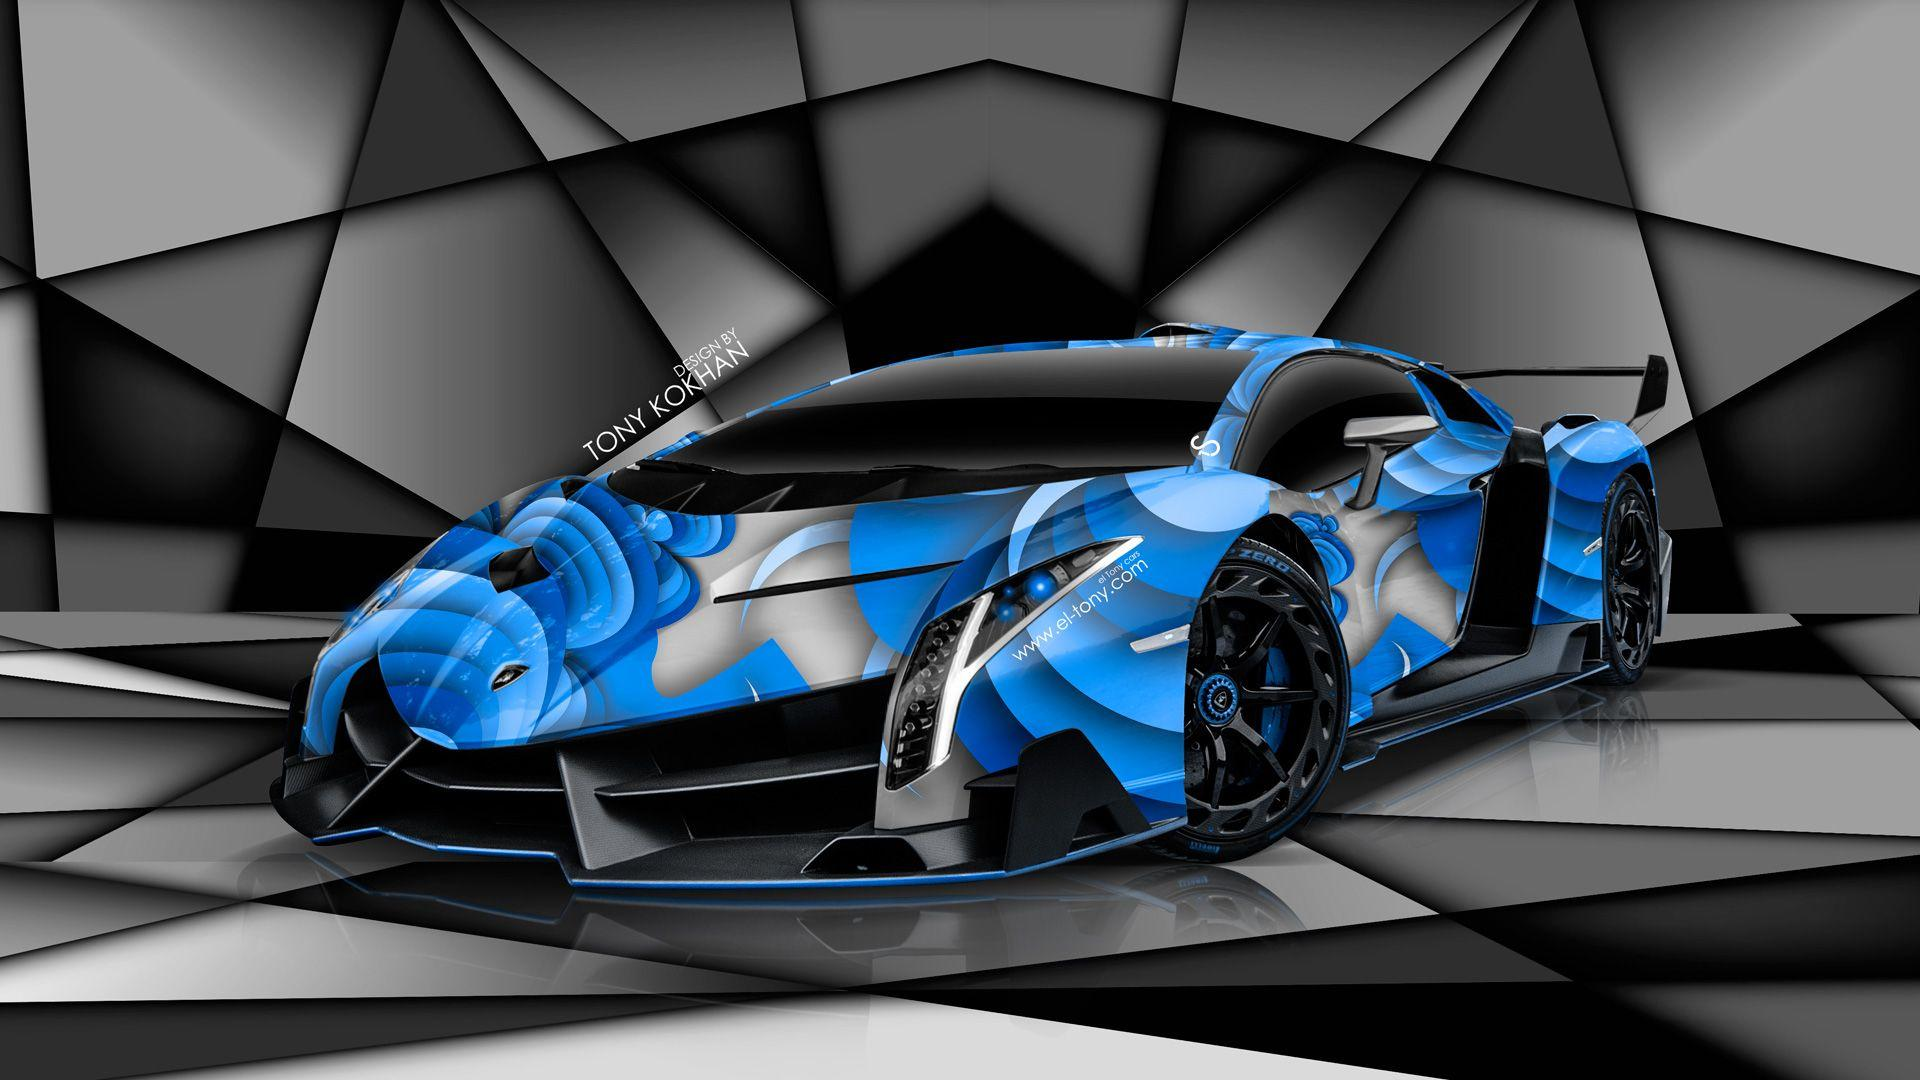 Black And Blue Lamborghini Wallpaper 14 Free